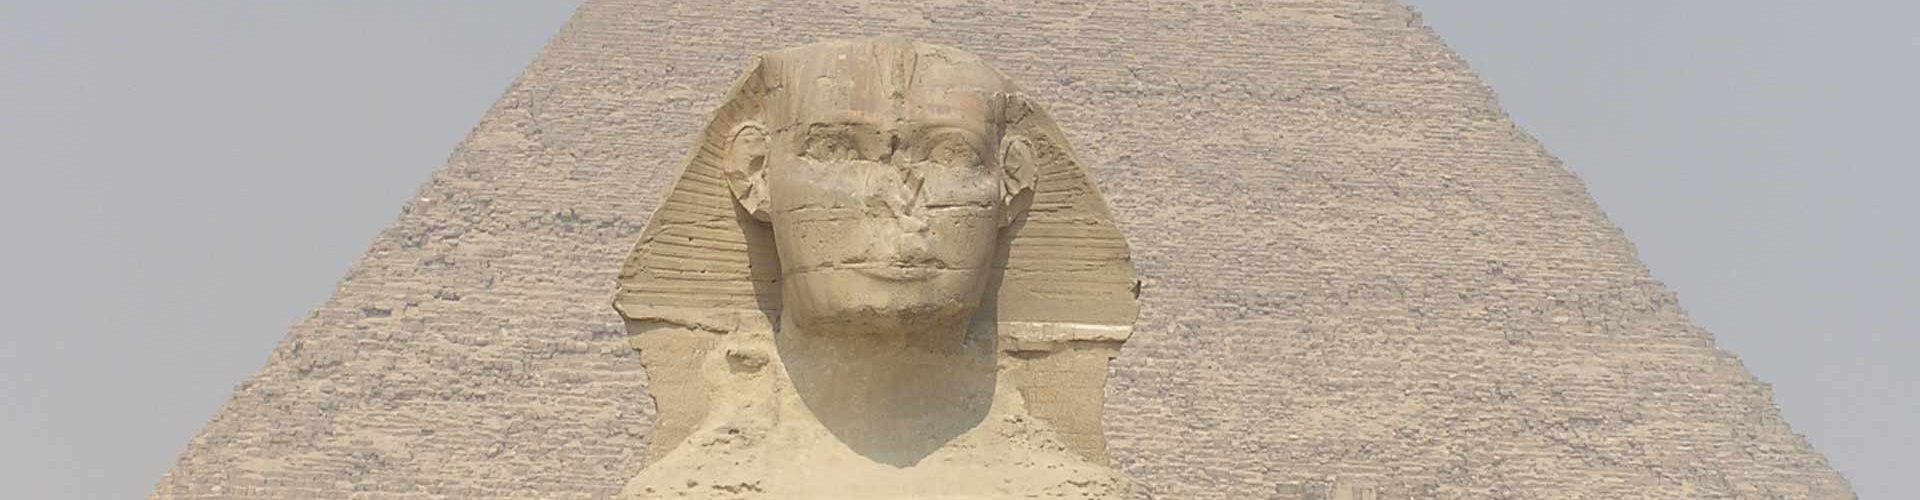 egypt-holidays01